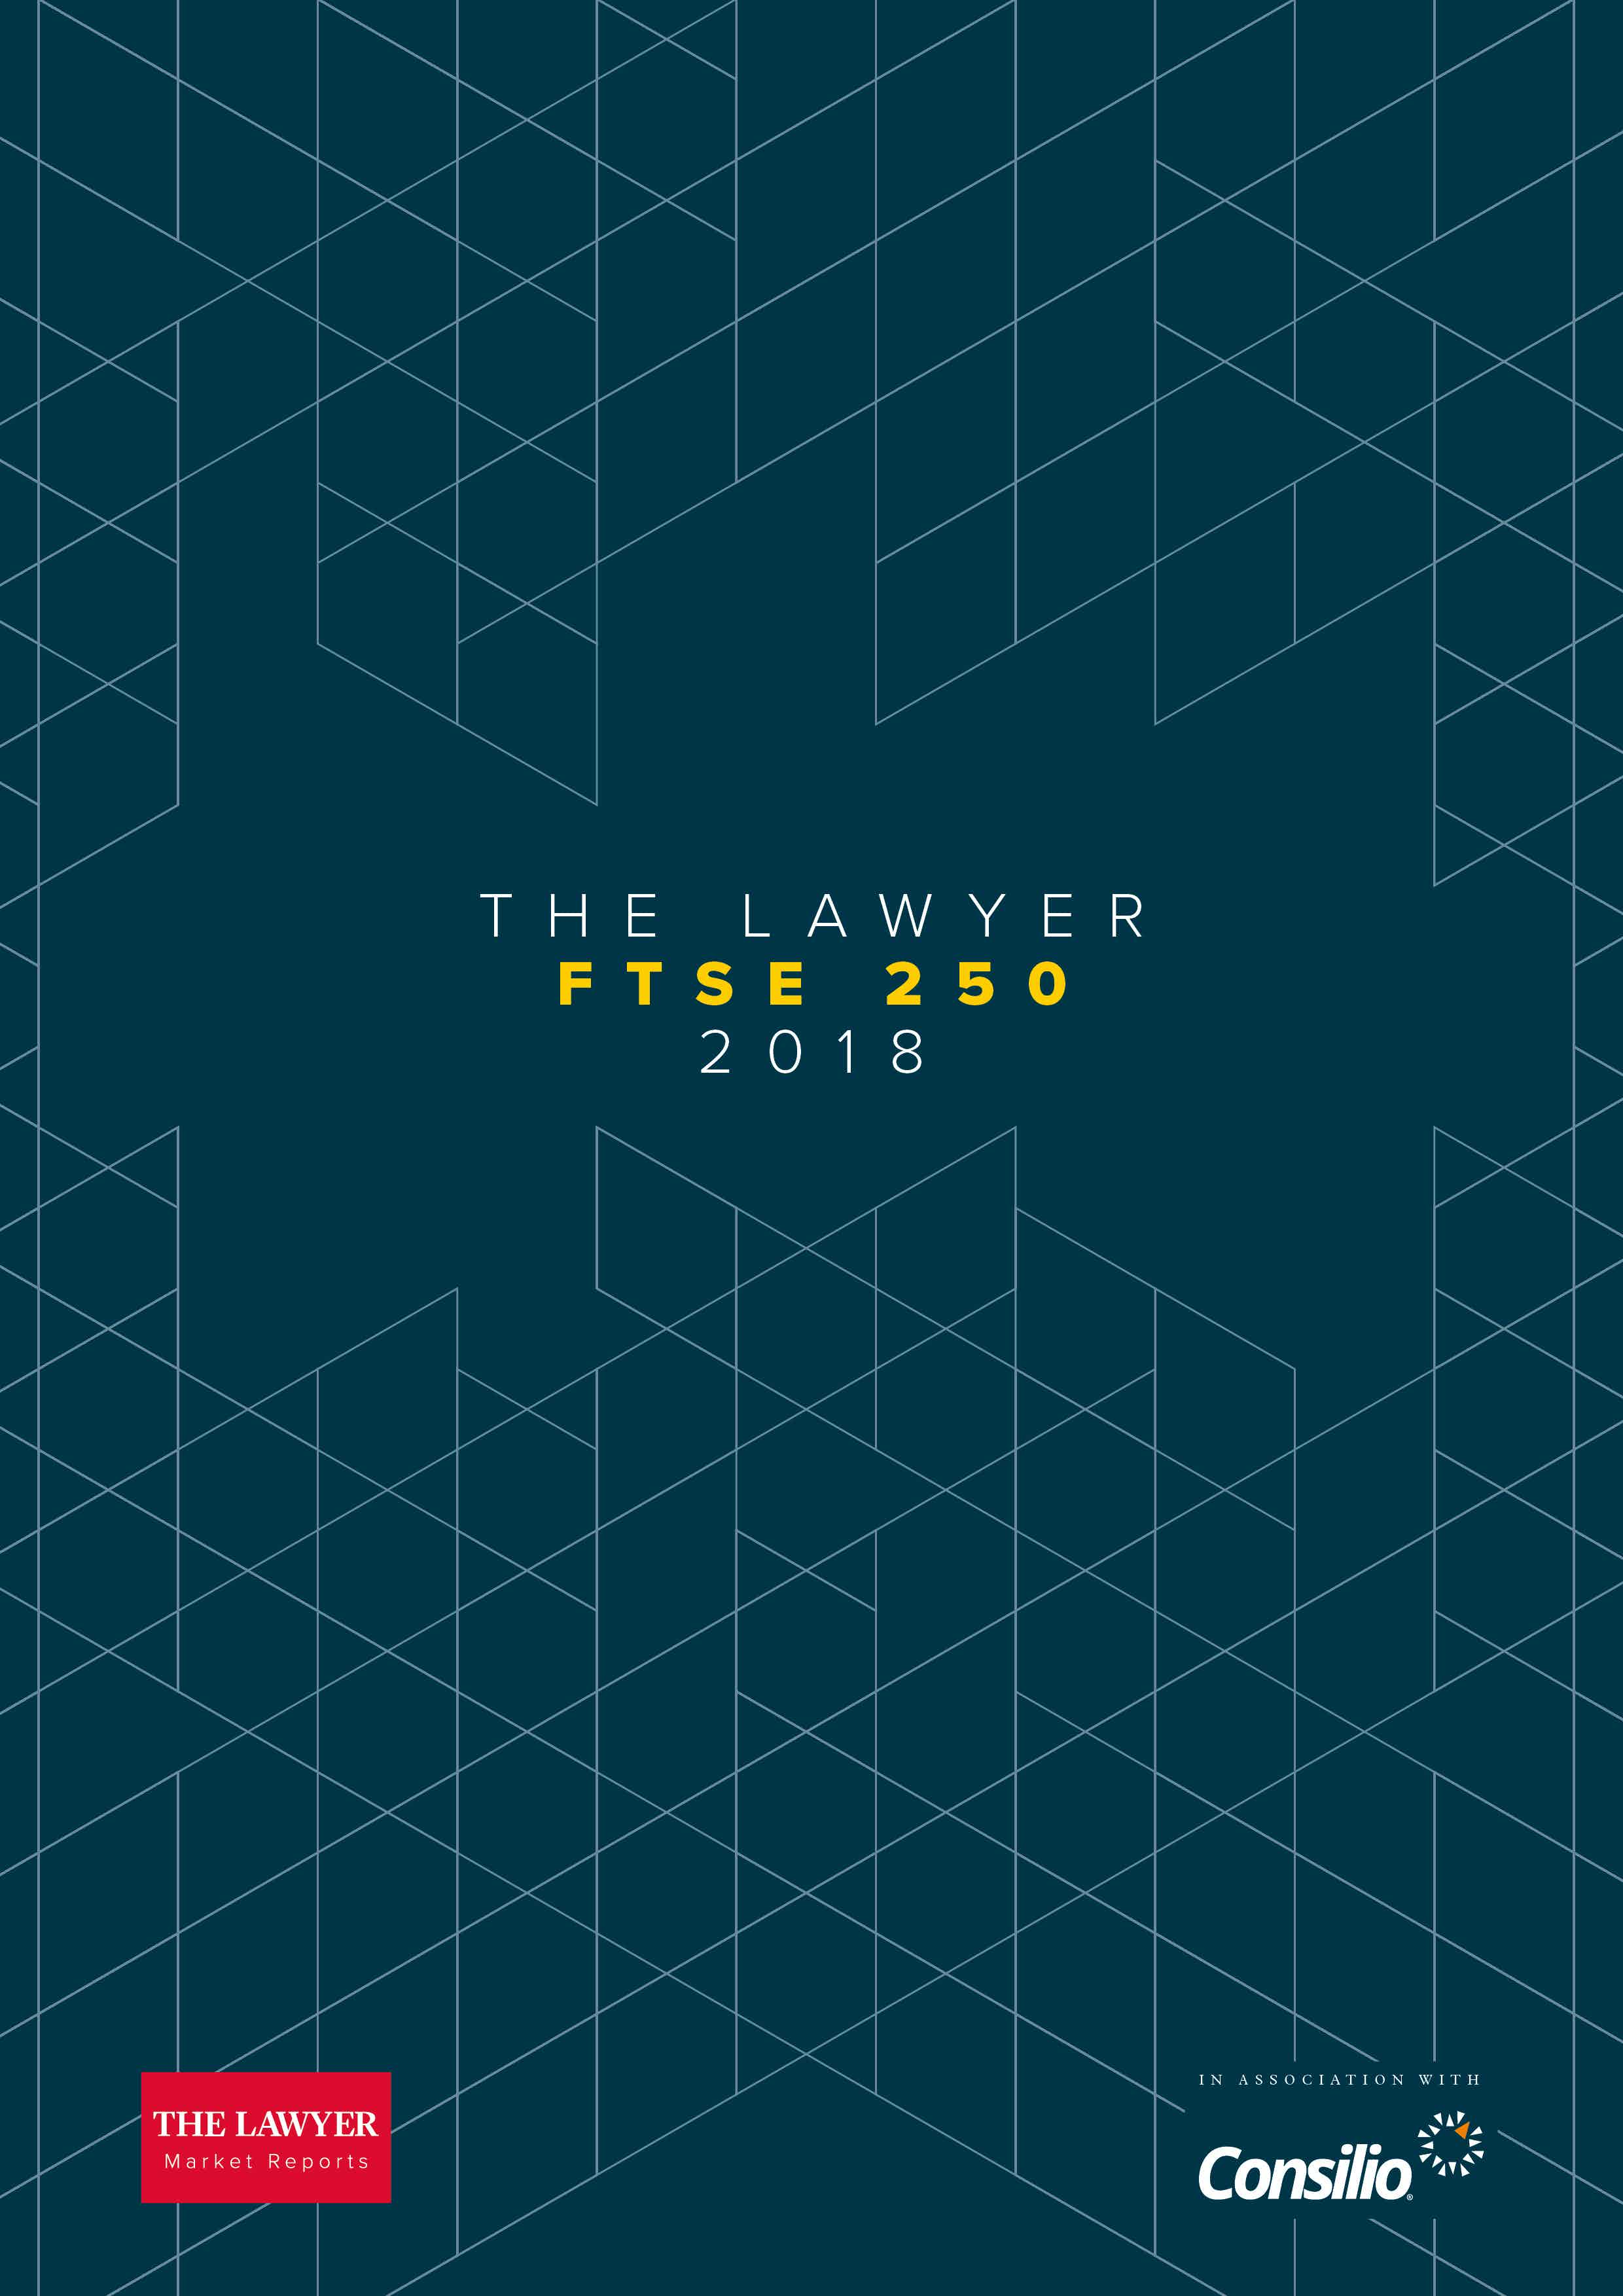 FTSE 250 2018 cover